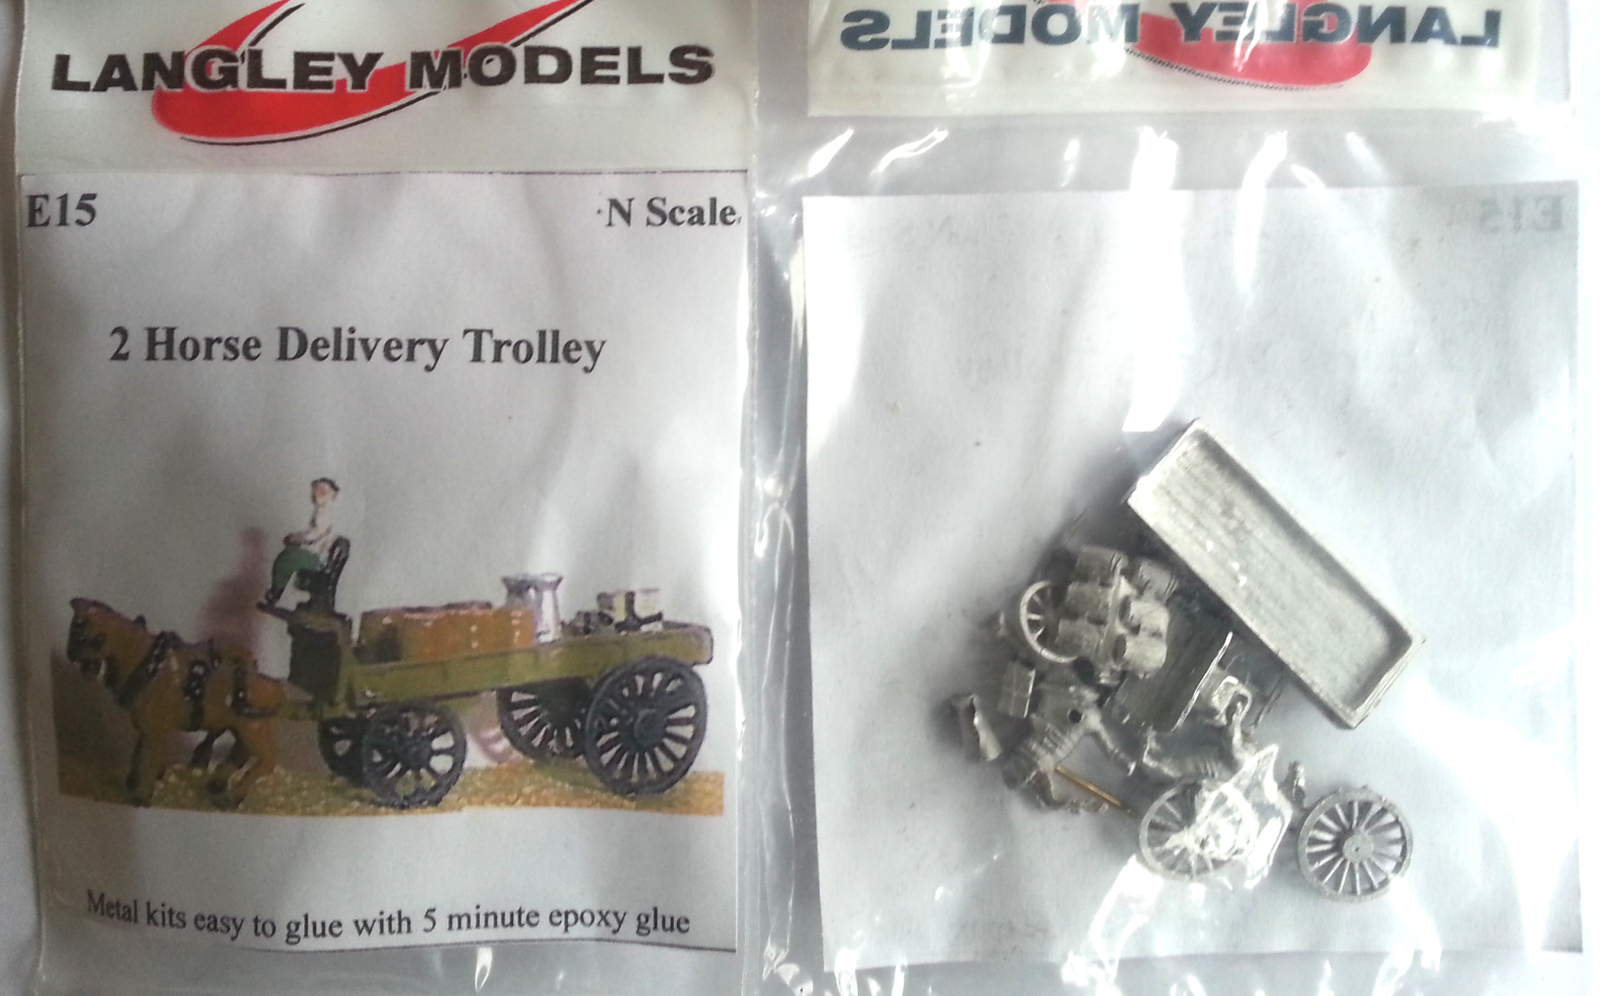 Drawn trolley model horse Models Horse Drawn Scale horses